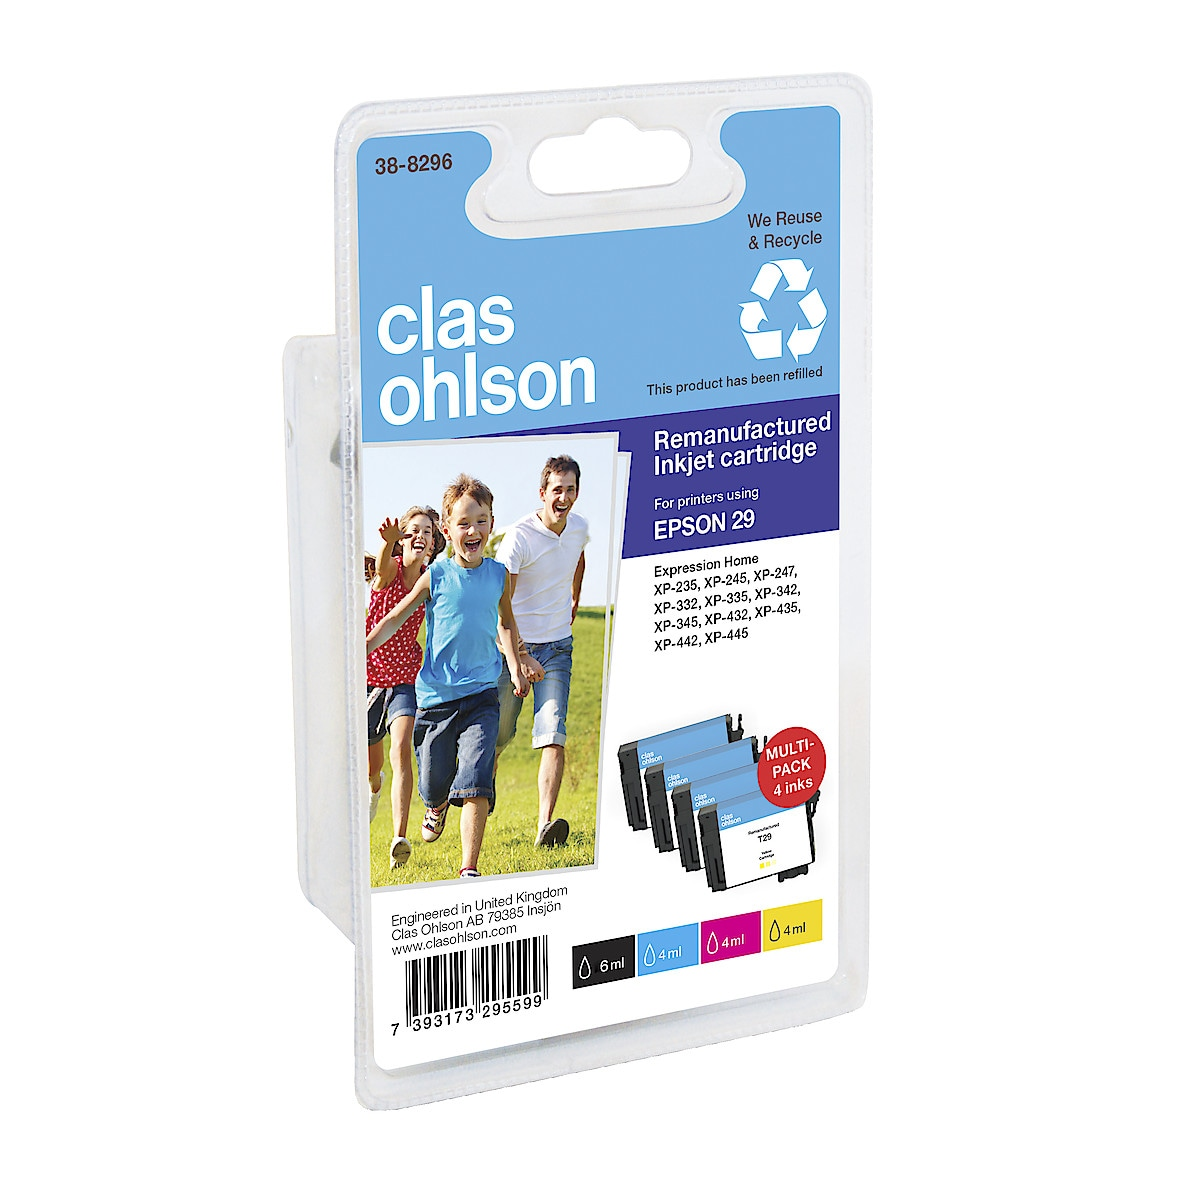 Clas Ohlson blekkpatron Epson 29